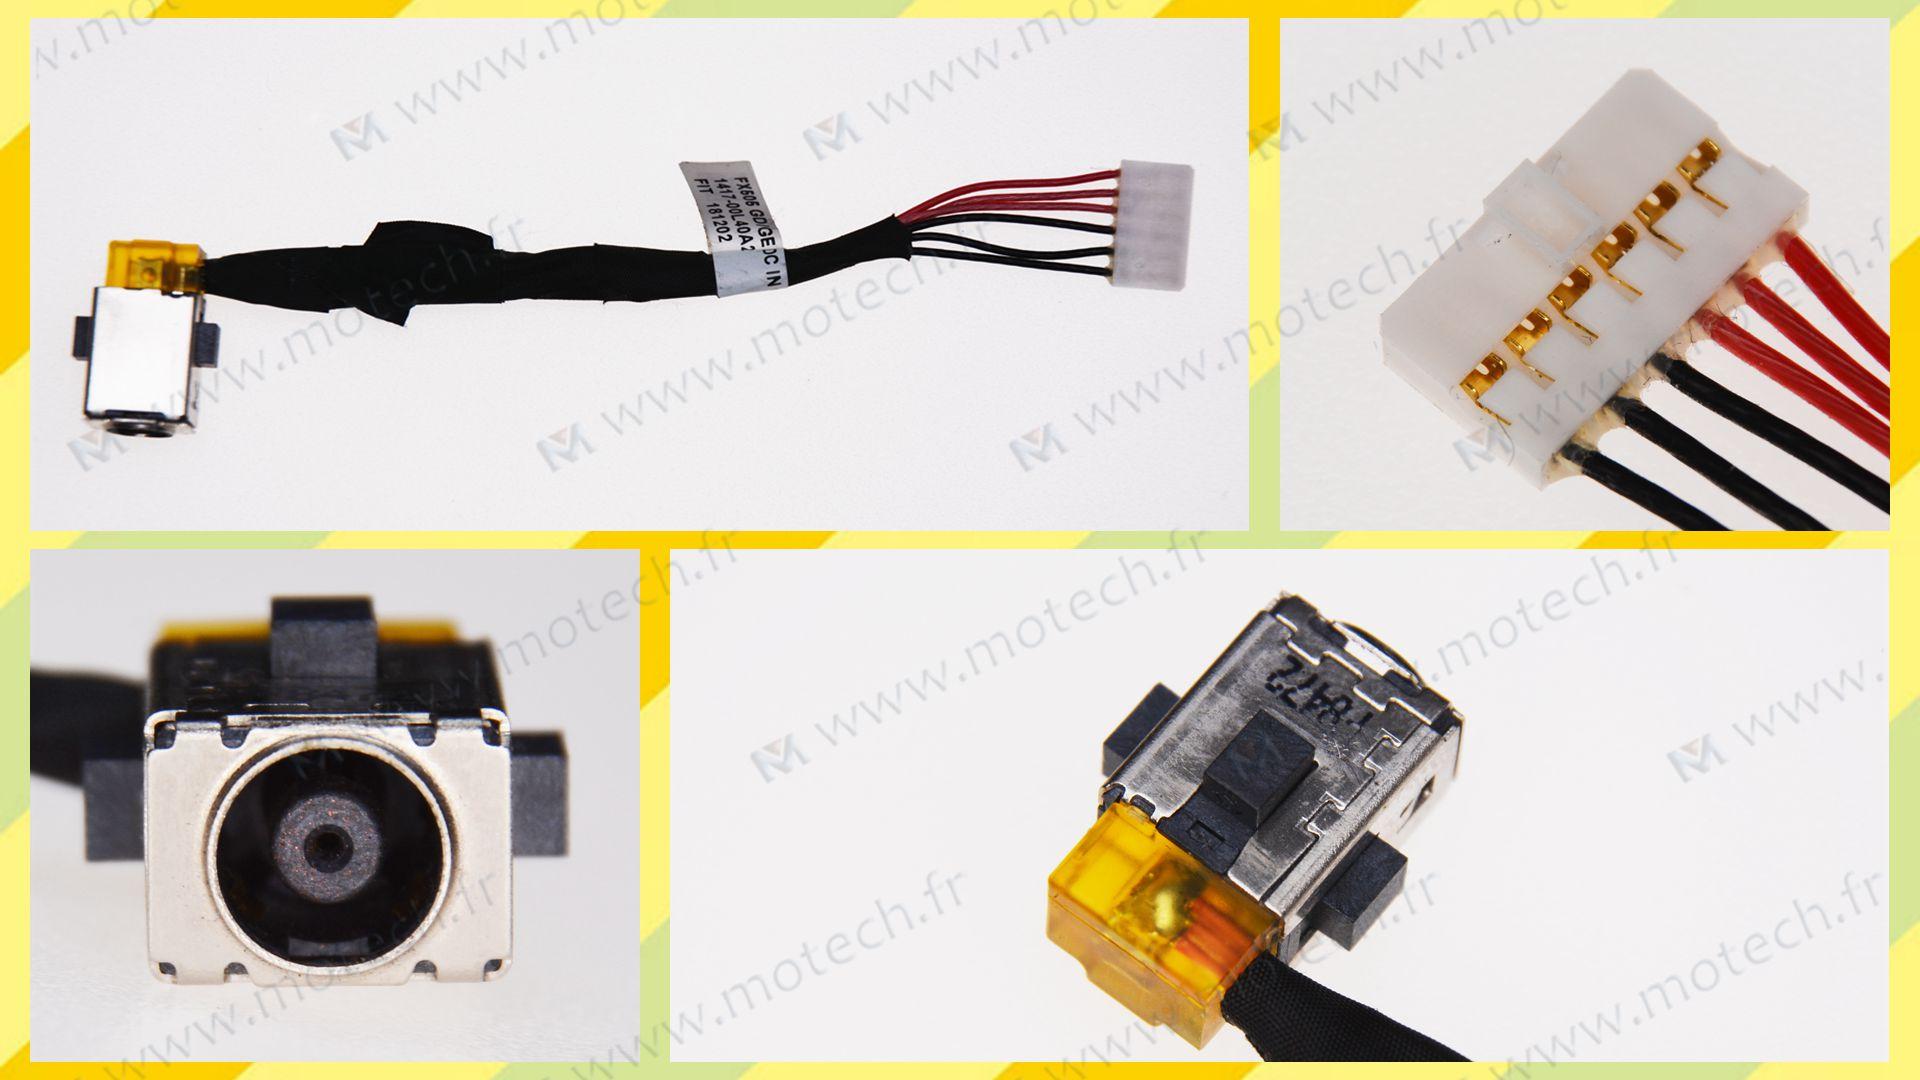 Asus TUF765GE-EV088T charging connector, Asus TUF765GE-EV088T DC Power Jack, Asus TUF765GE-EV088T DC IN Cable, Asus TUF765GE-EV088T Power Jack, Asus TUF765GE-EV088T plug, Asus TUF765GE-EV088T Jack socket, Asus TUF765GE-EV088T connecteur de charge,